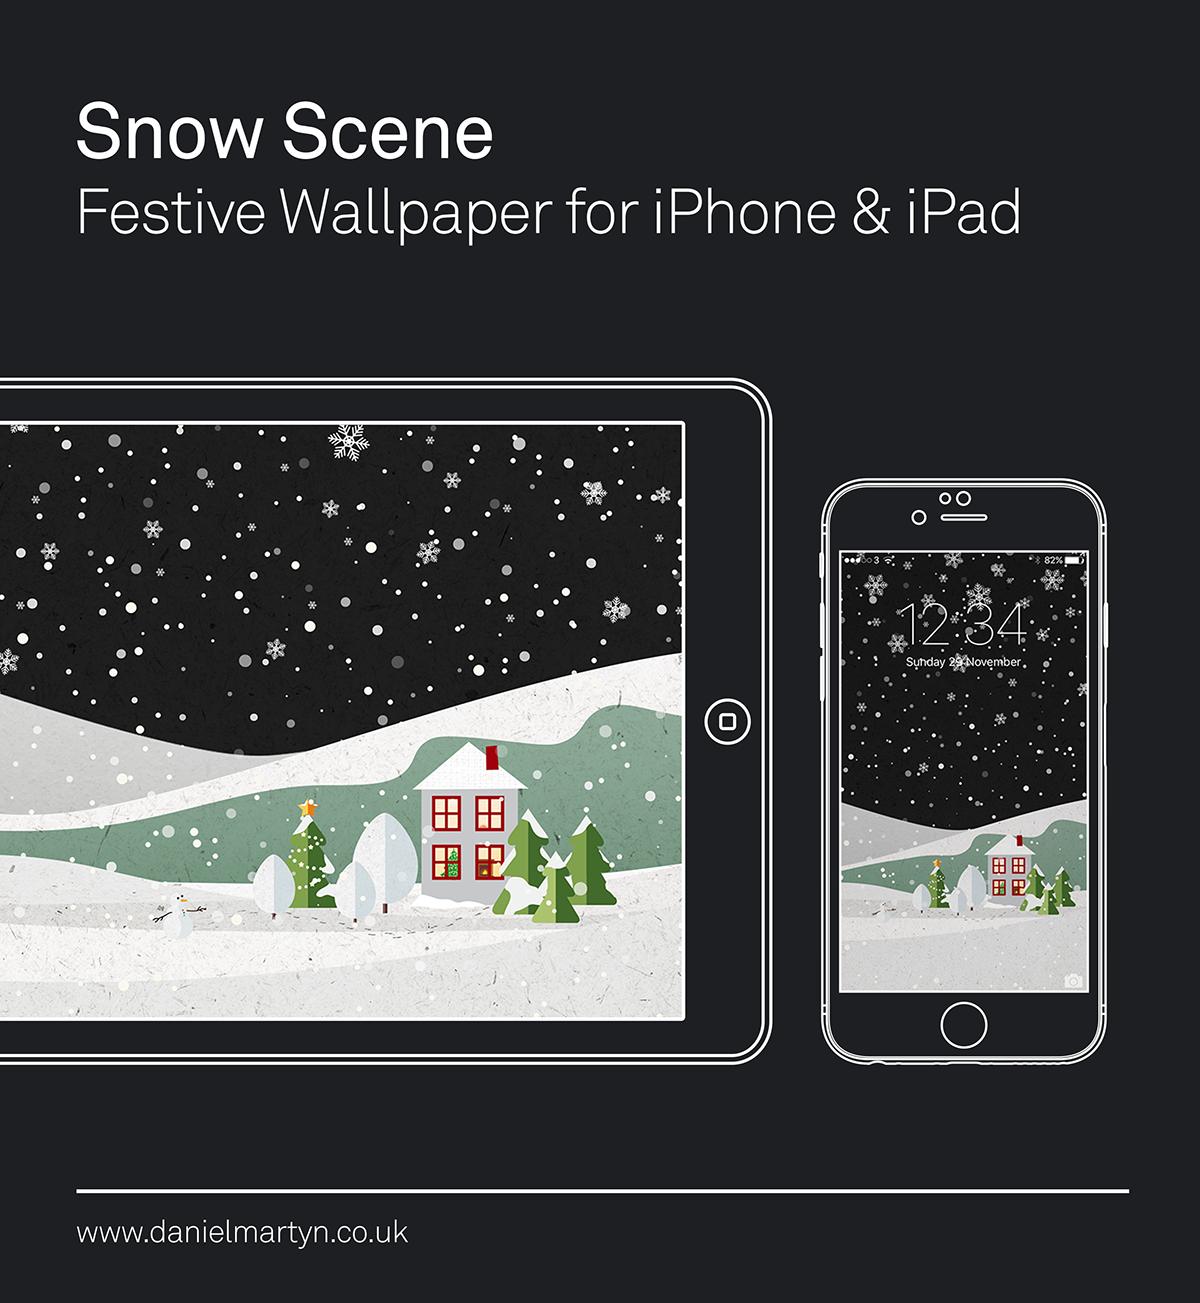 festive,wallpaper,iphone,snow,iPad,background,Christmas,snowy,house